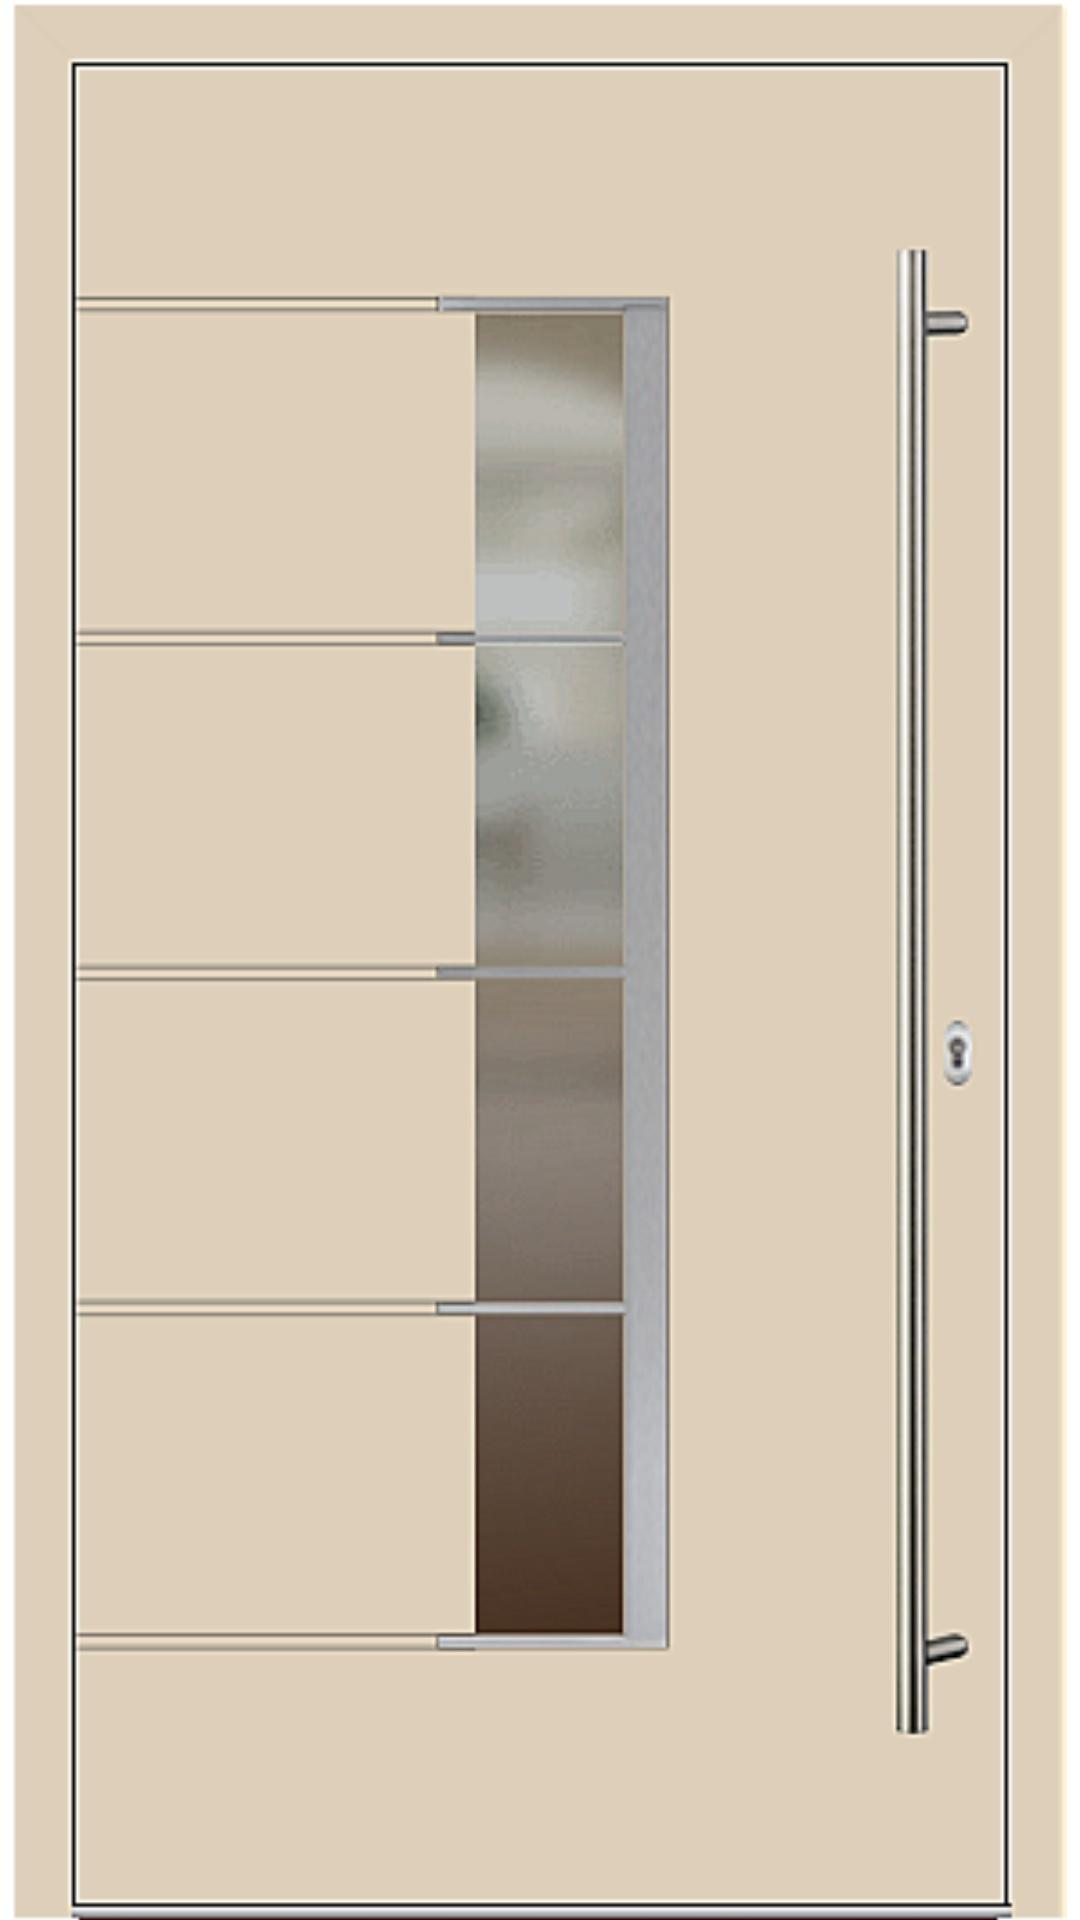 Holz-Alu Haustür Modell 66535 beige